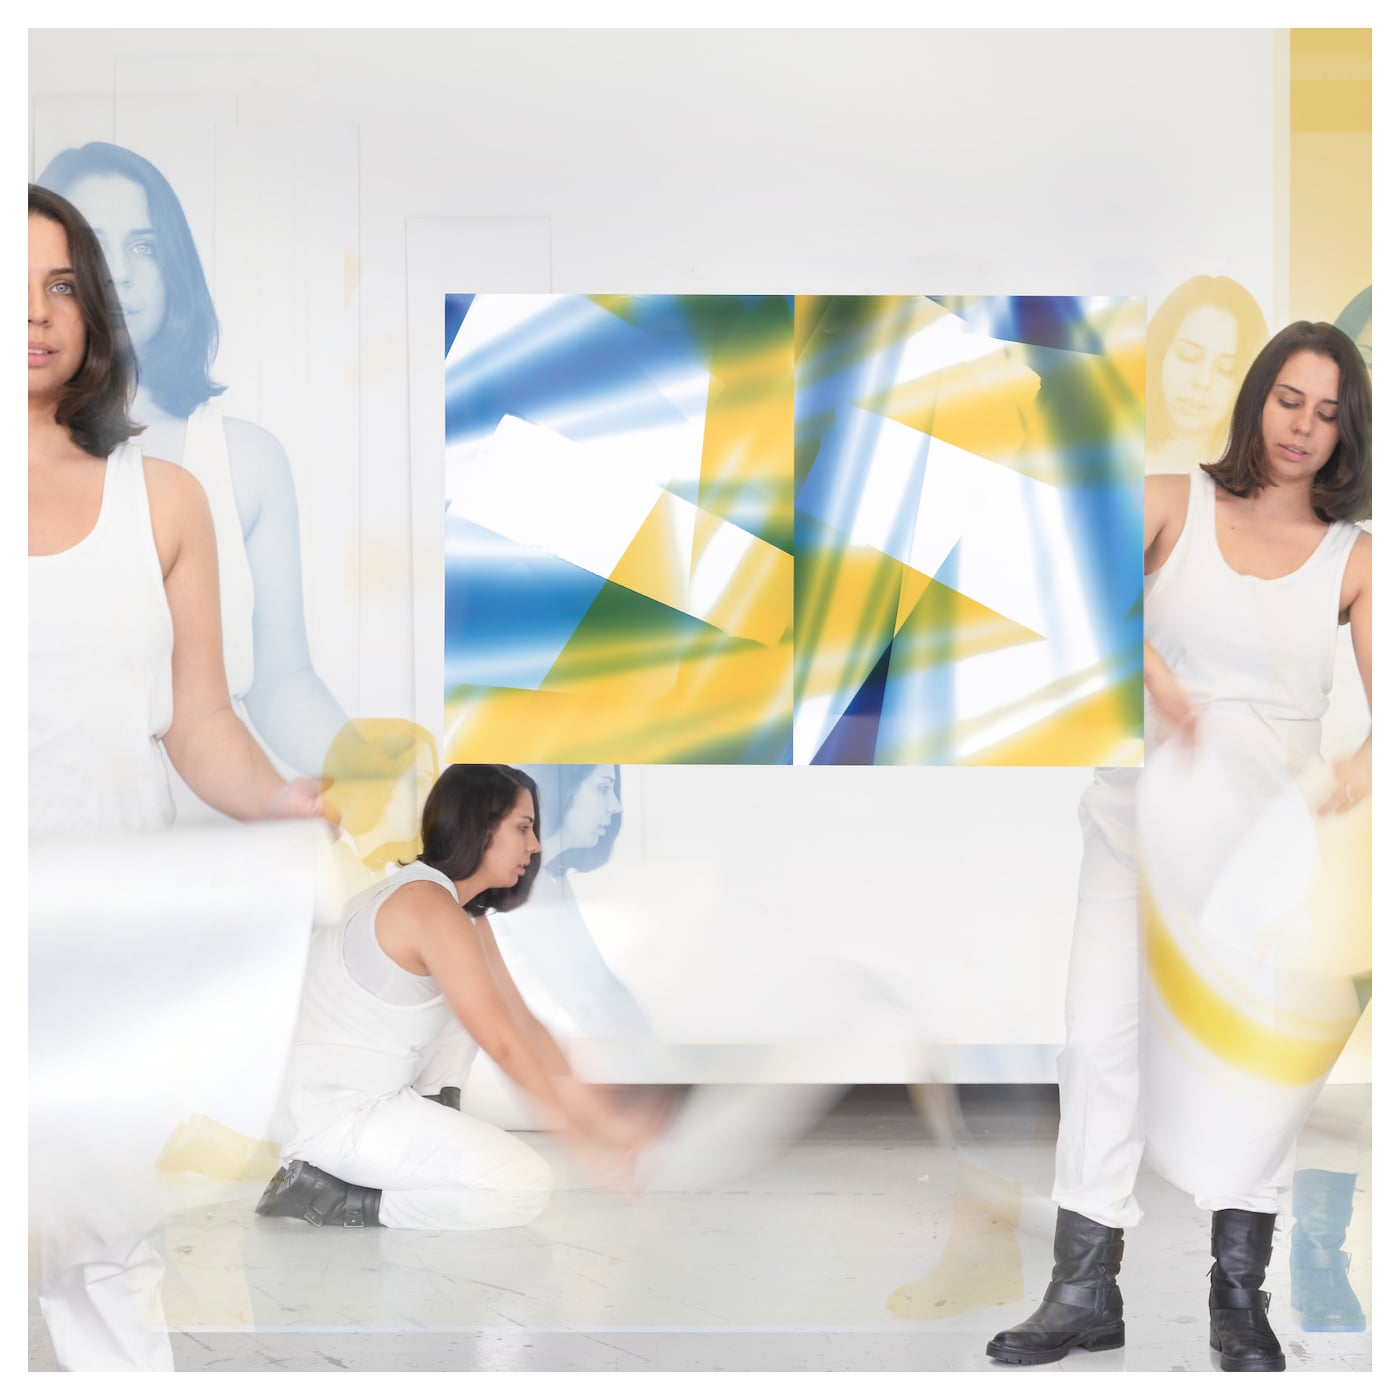 Ikea Art Event 2016 Poster Fixing The Light 61x91 Cm Ikea